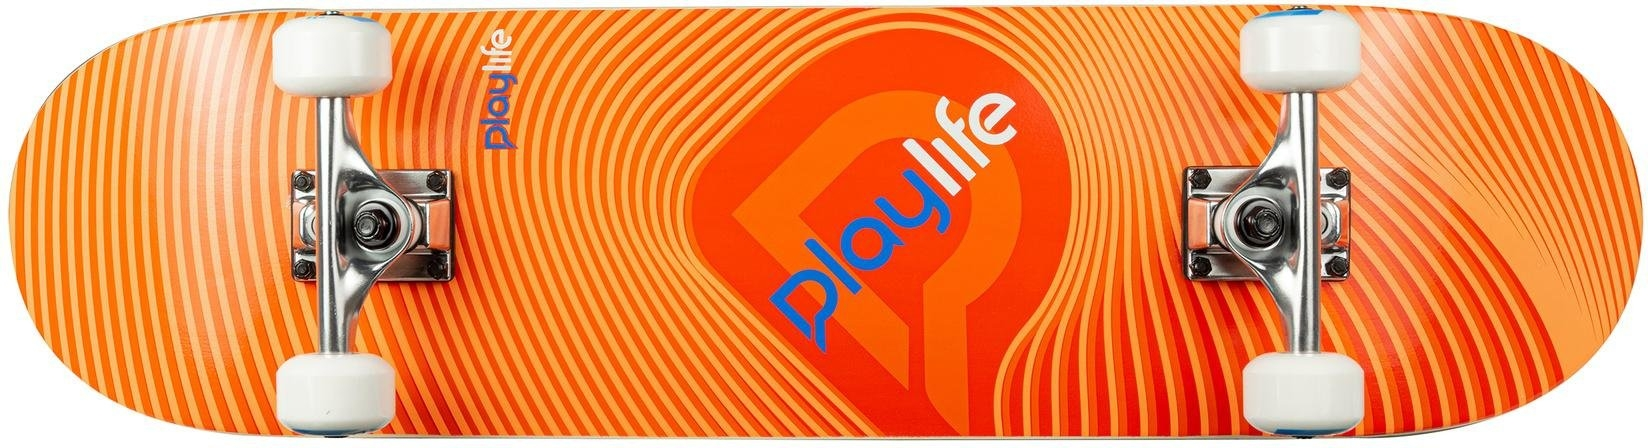 Playlife skateboard Illusion Orange online kopen op otto.nl